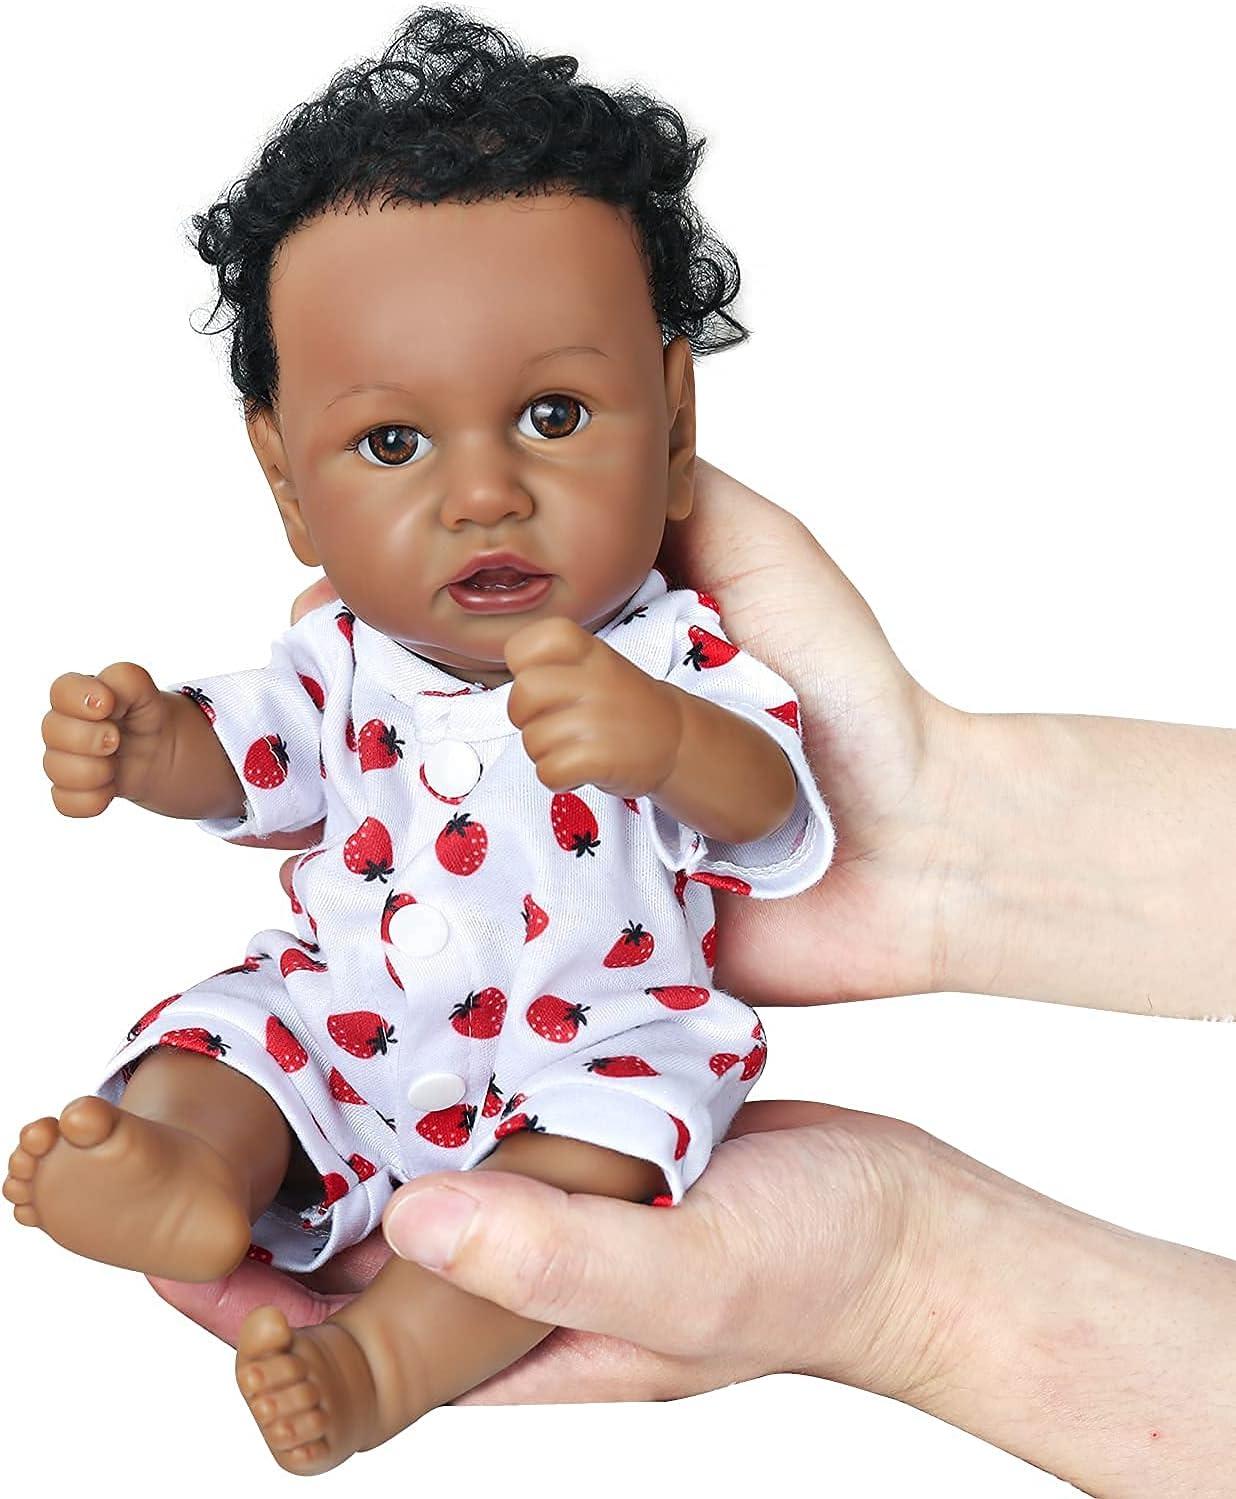 Reborn Japan Maker New Baby Doll Silicone Full Body Bombing new work Black 12 Lifelike Inch Afri